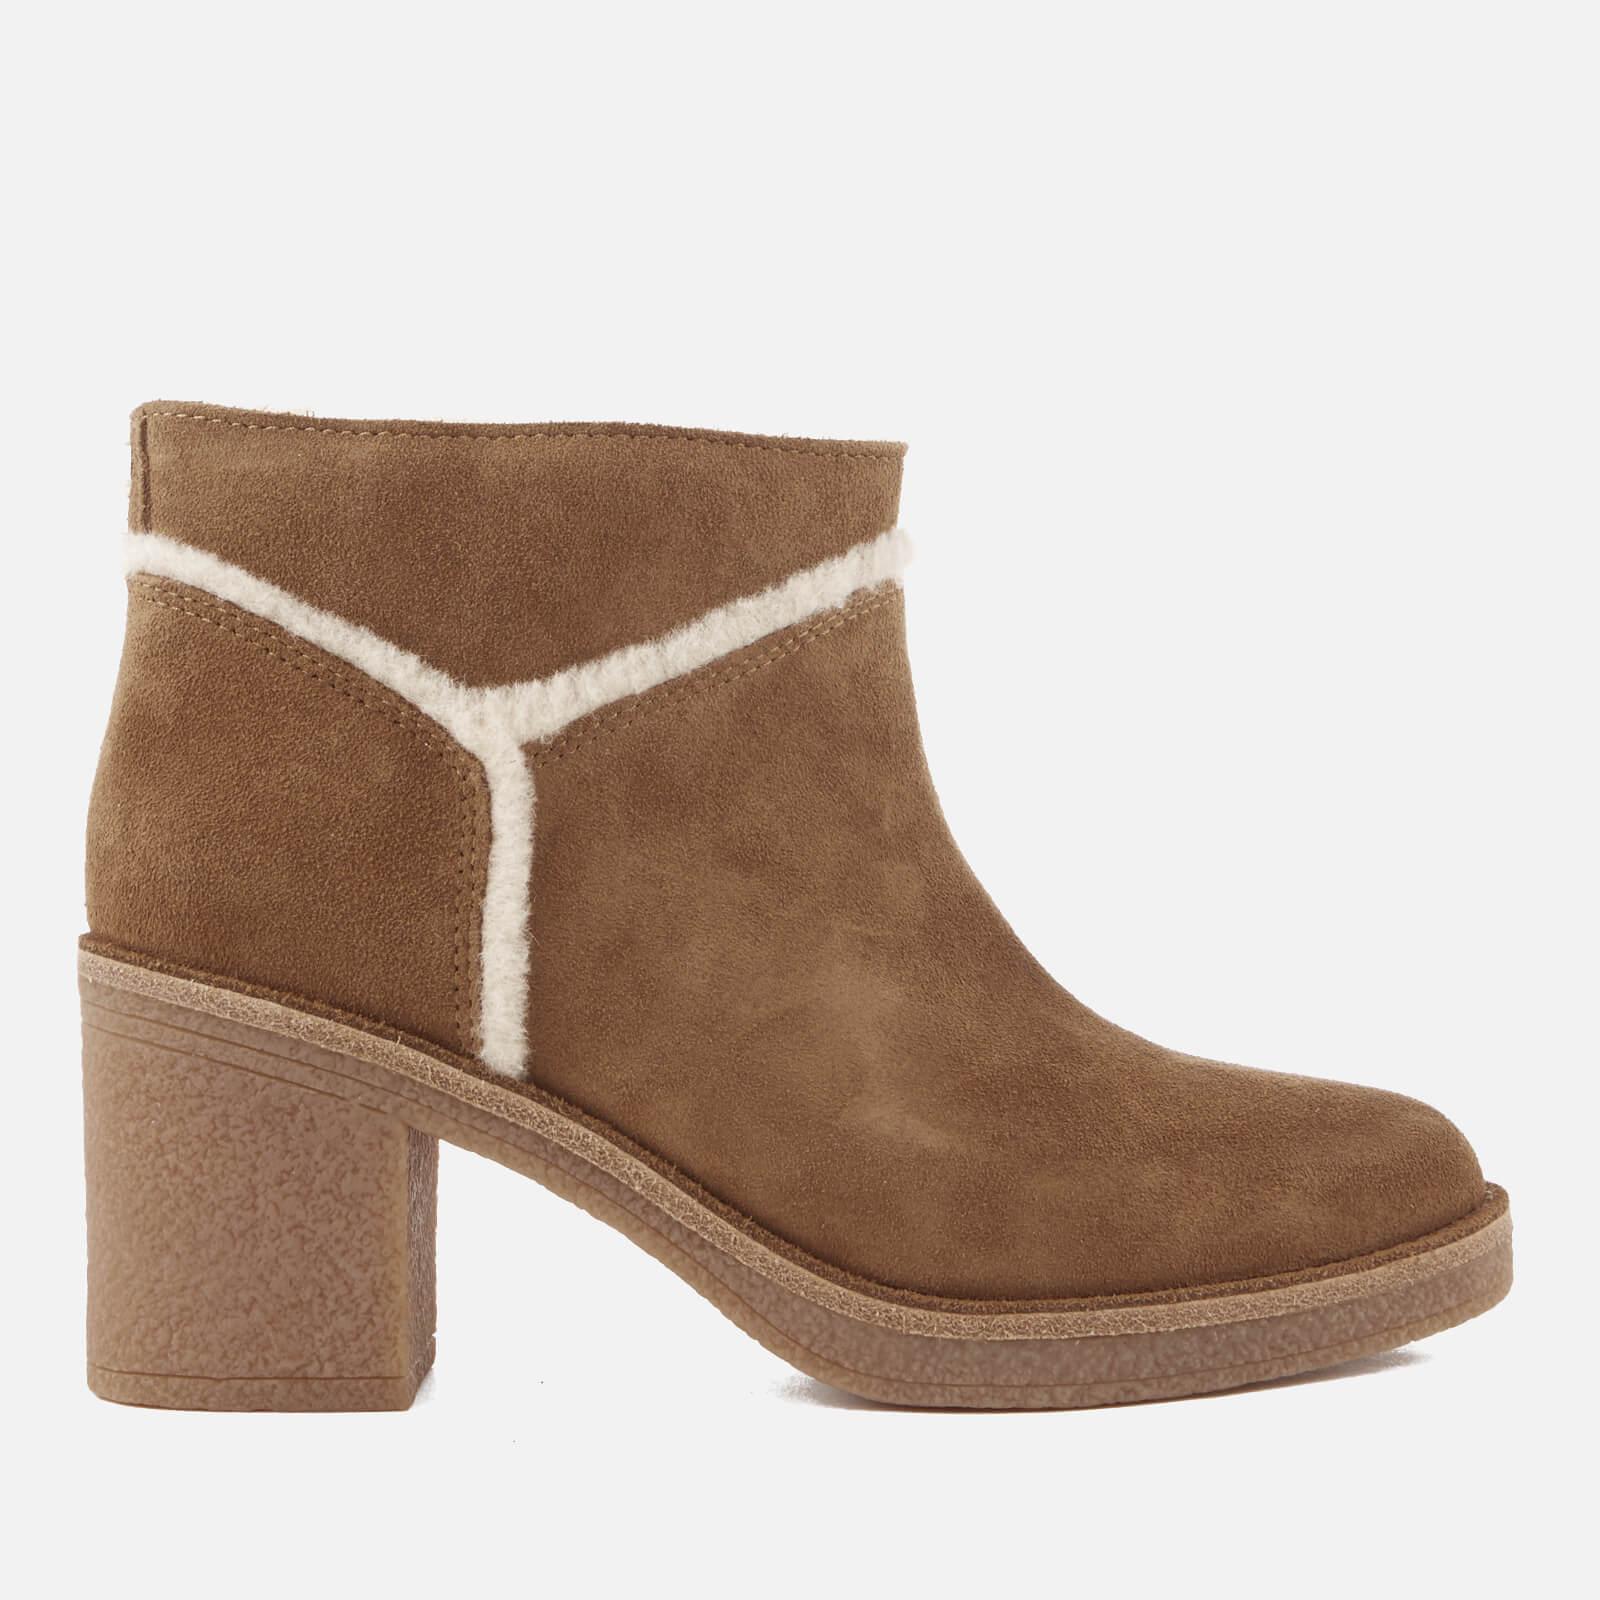 cc497ace0cd UGG Women's Kasen Suede Heeled Ankle Boots - Chestnut